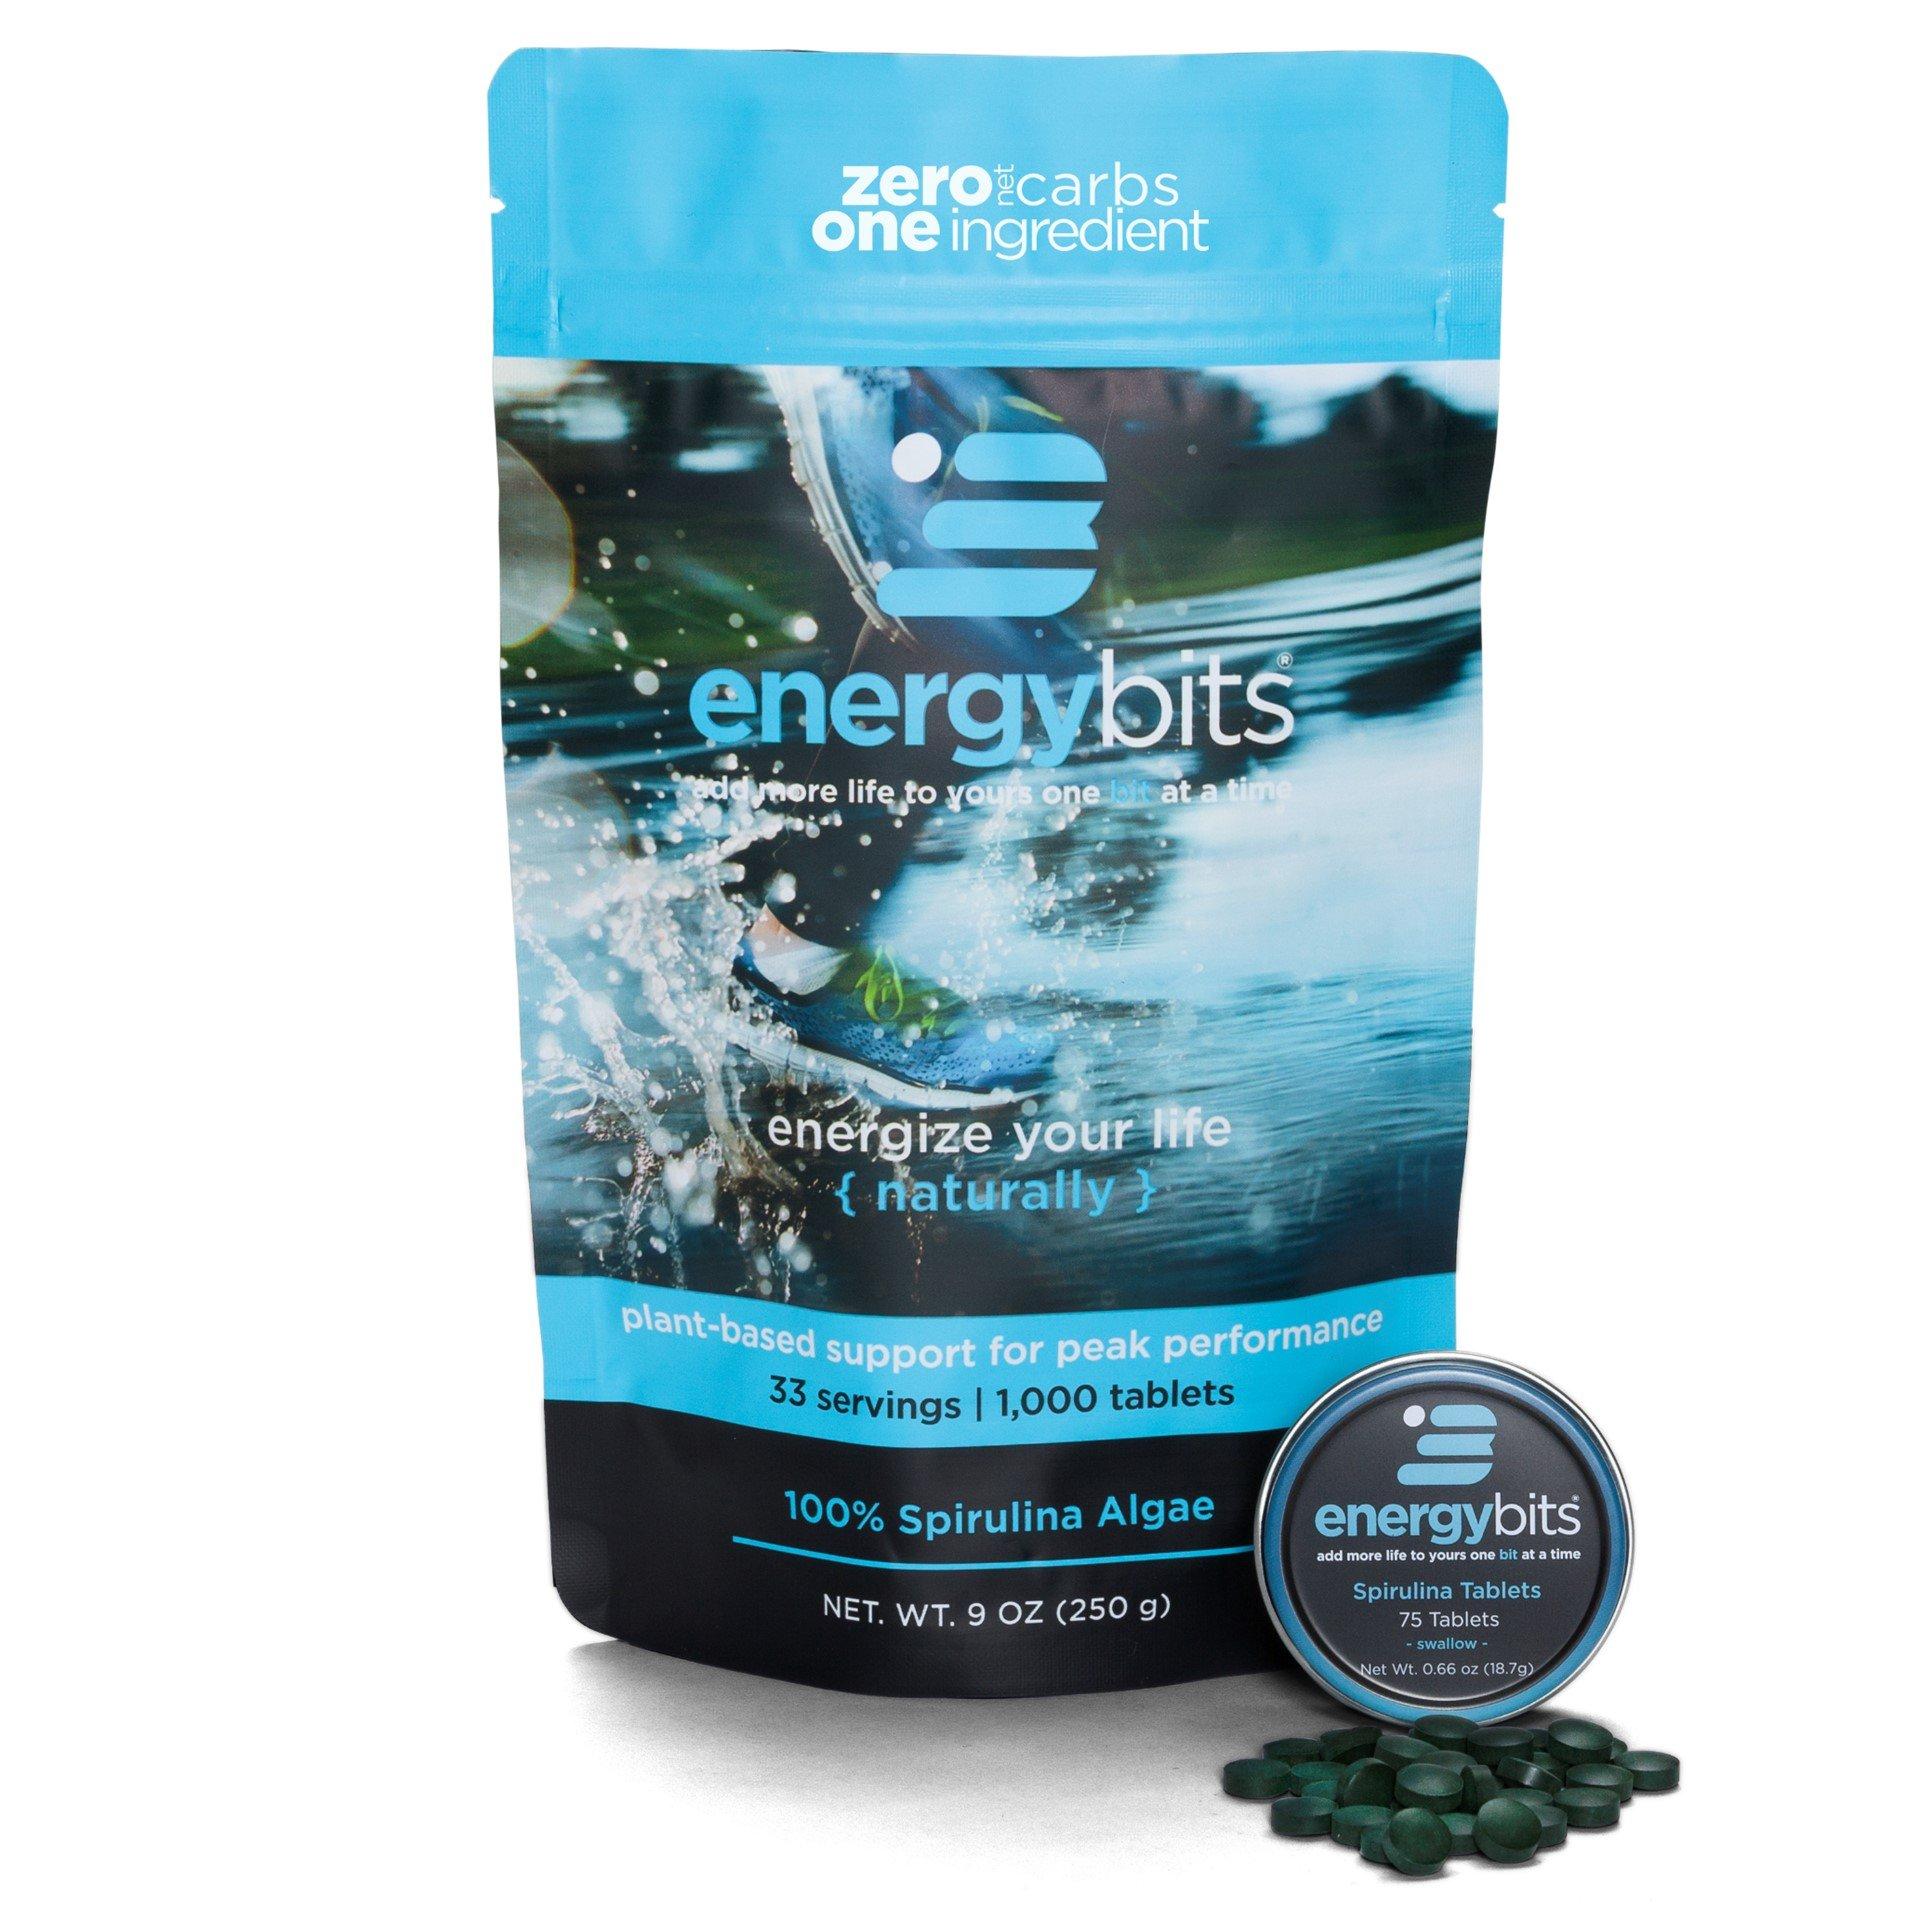 ENERGYbits Pure Organic Spirulina Tablets – Bag of 1,000 Tablets (250mg per tablet) – Non-GMO, Non-Irradiated, Raw, Blue Green Algae – Keto, Paleo, Vegan Friendly